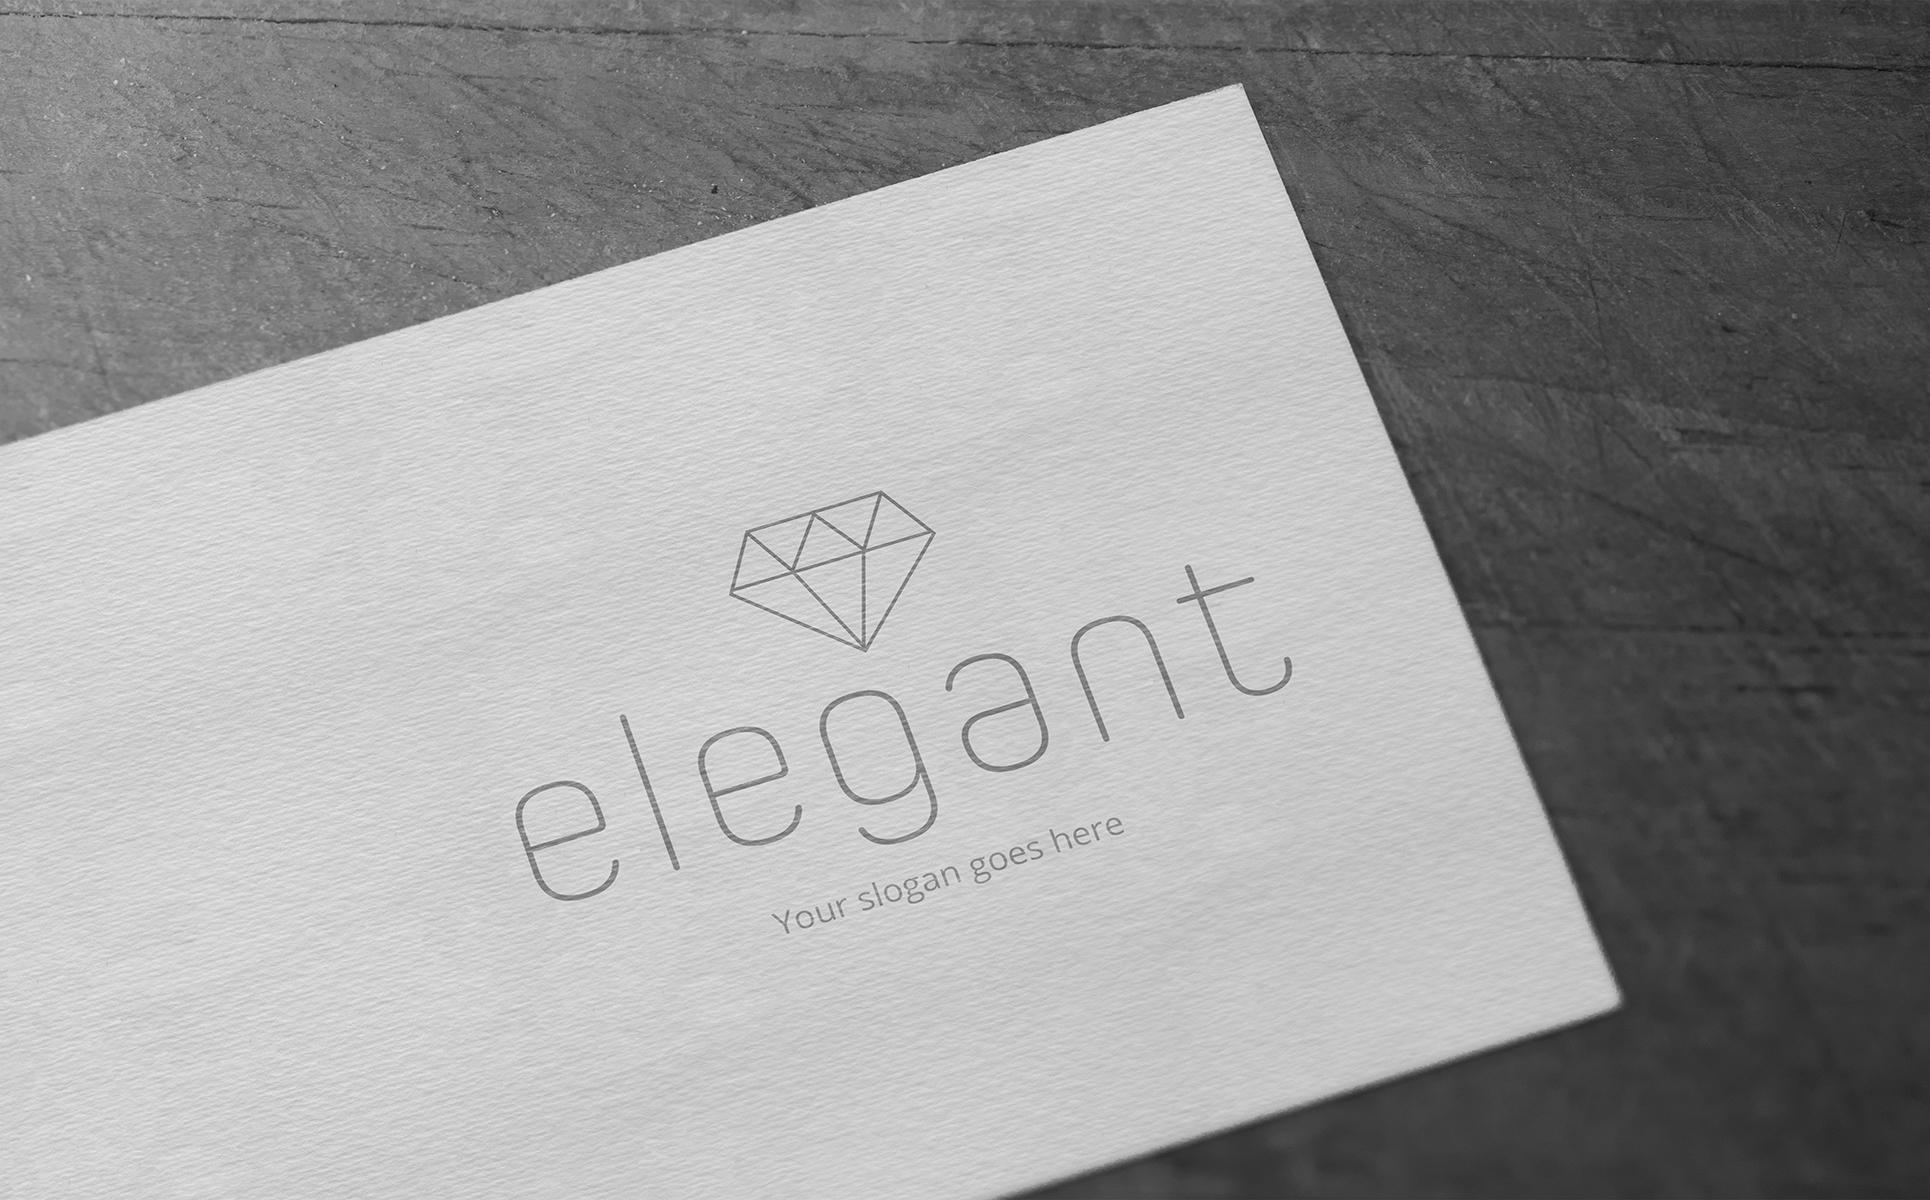 Elegant design for multipurpose business logo template 65160 zoom in colourmoves Images